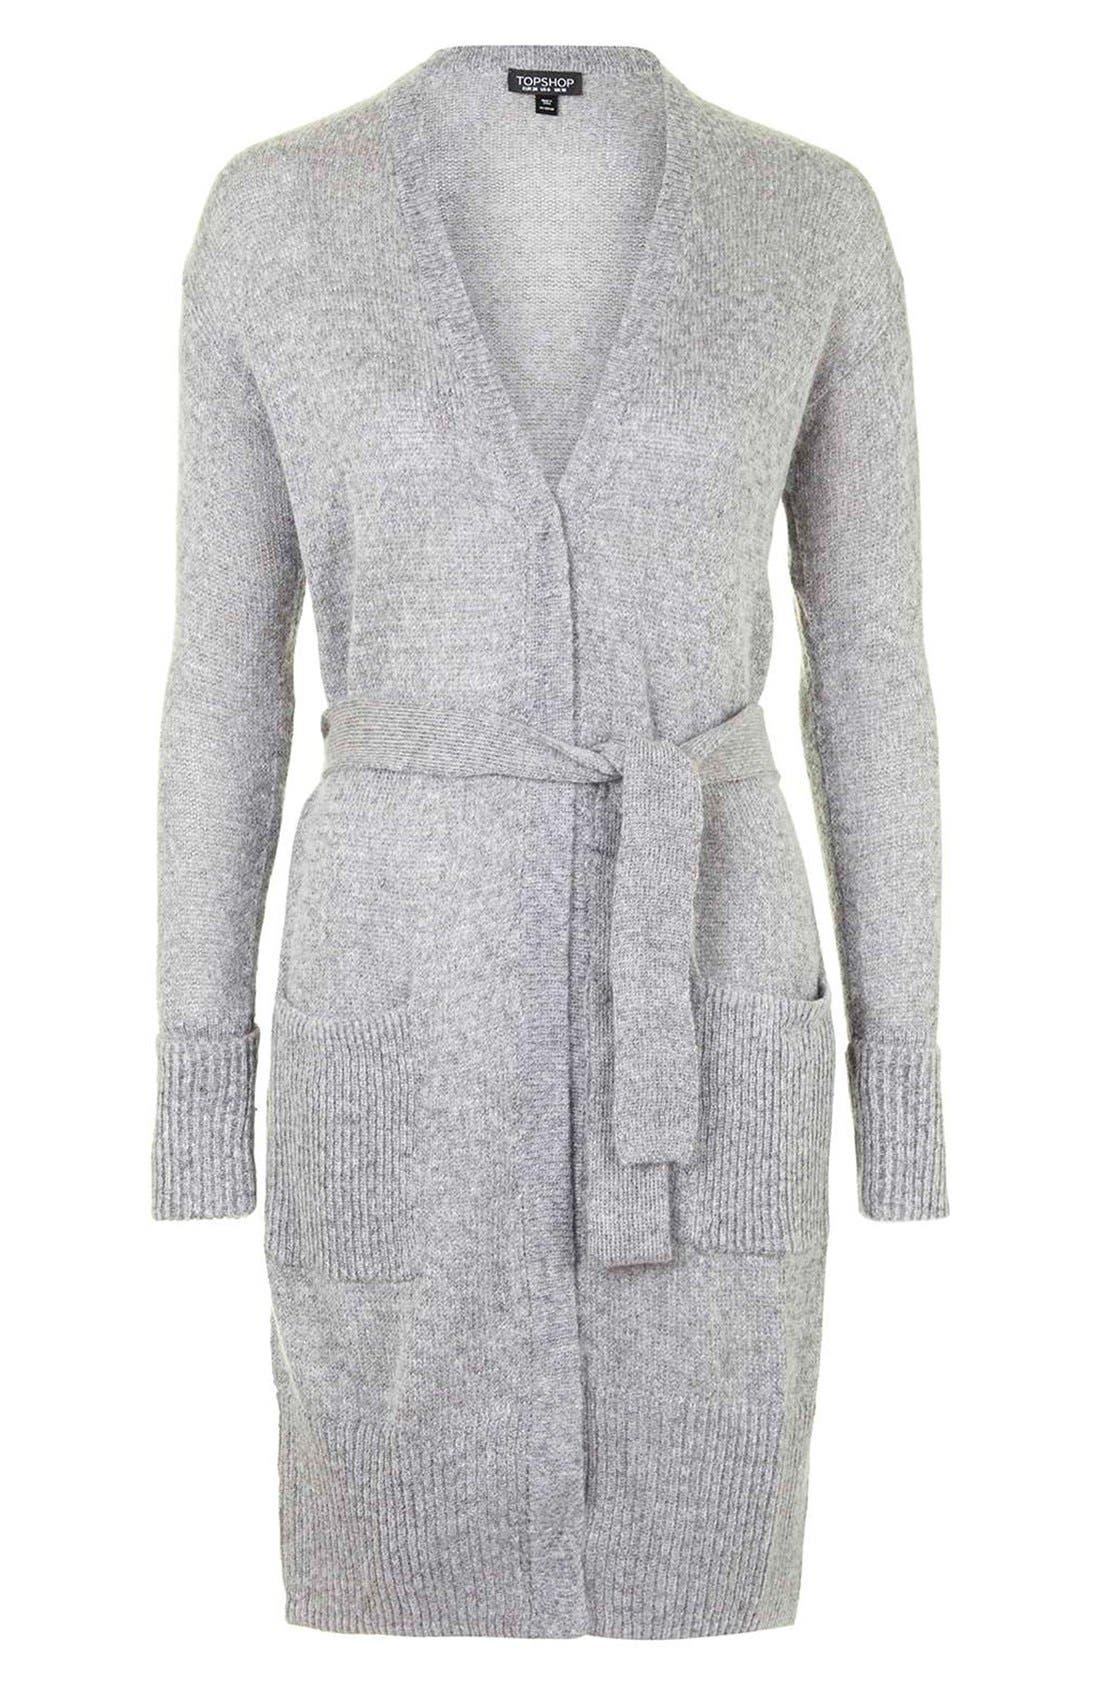 'Lulu' Belted Longline Cardigan,                             Alternate thumbnail 5, color,                             Light Grey